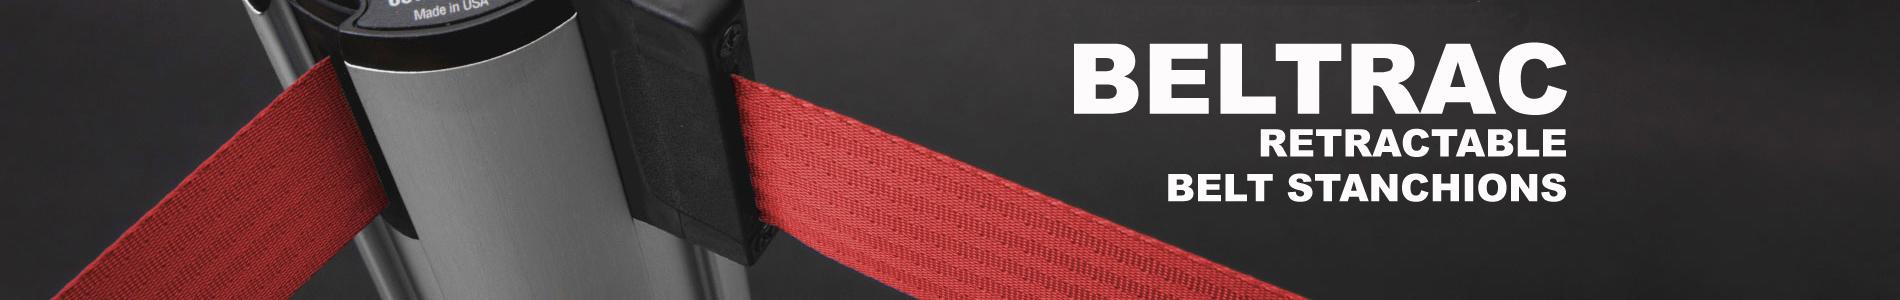 Beltrac Retractable Belt Stanchions Solutions